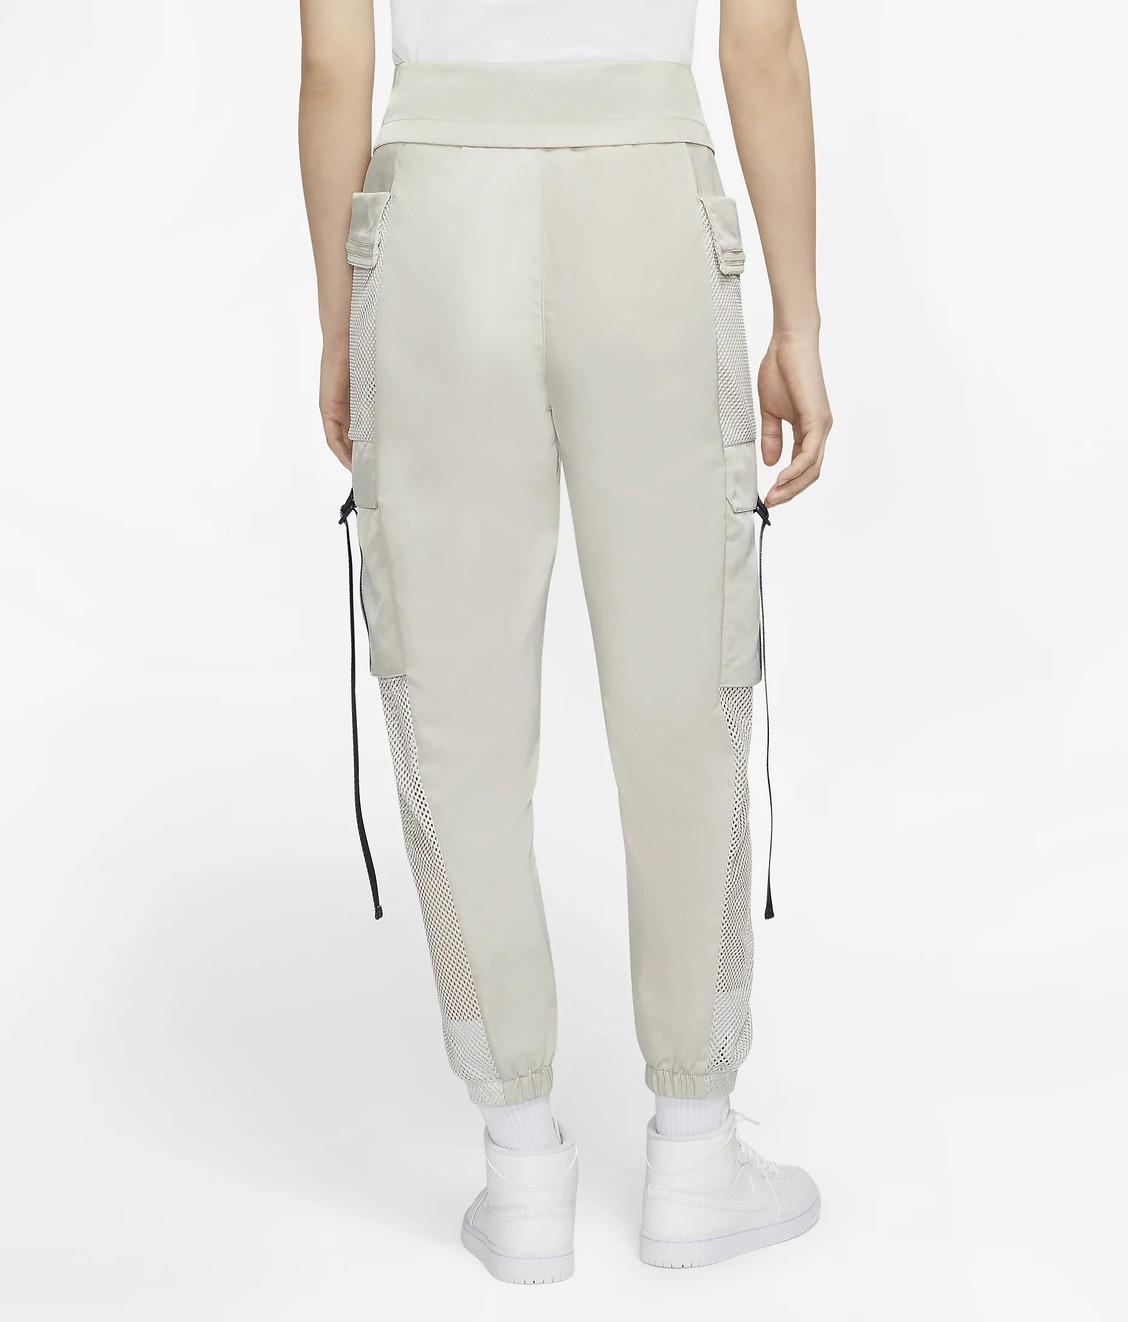 Nike Nike Jordan Utility Pant Beige